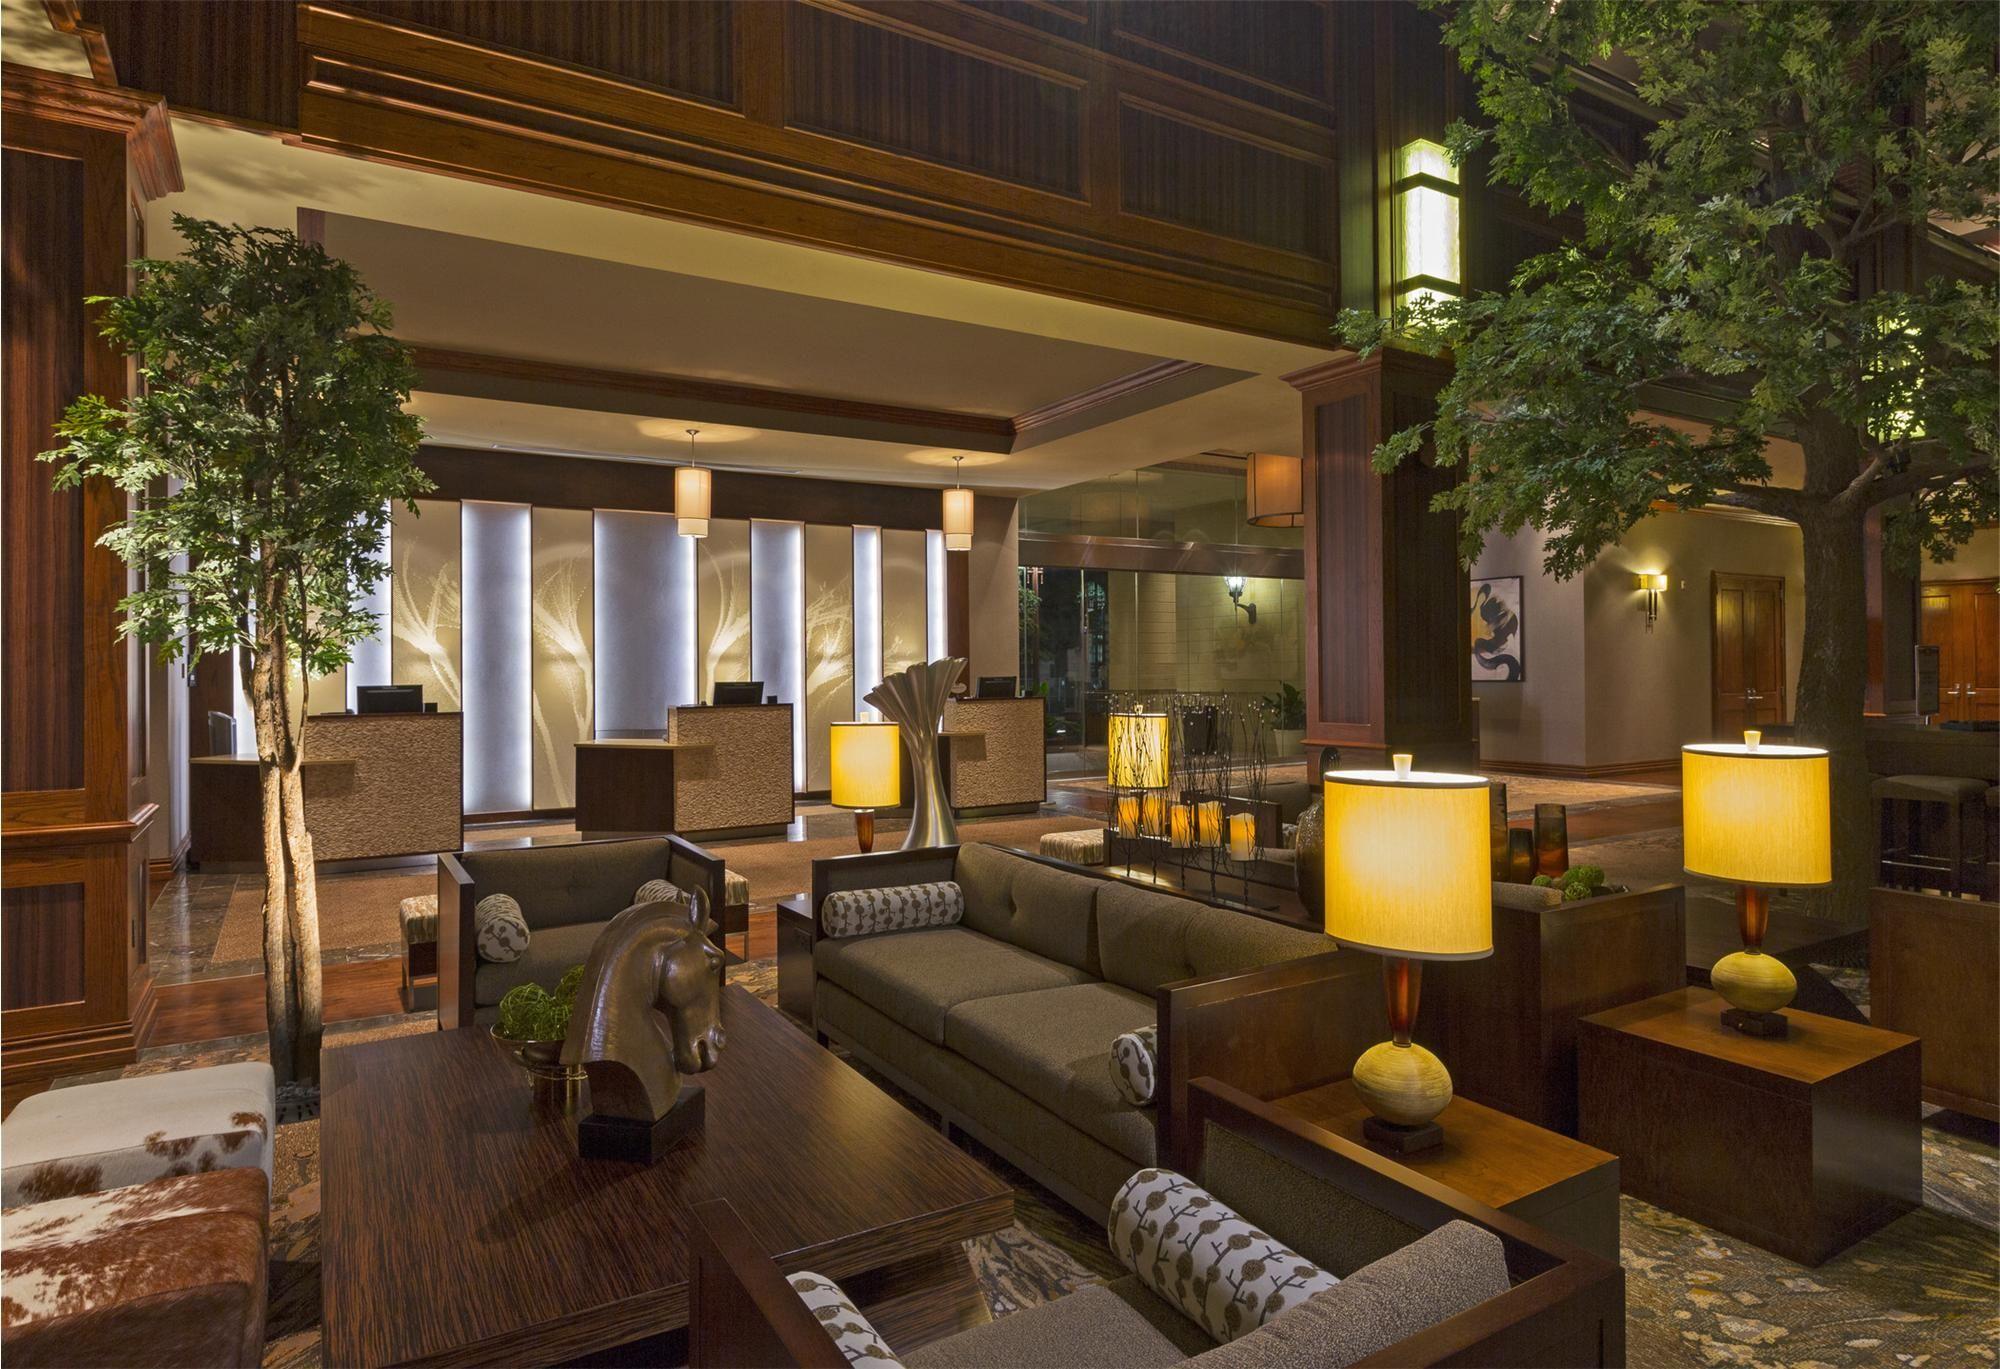 westin houston hotels front desk pods and backdrop use of wood on rh pinterest com